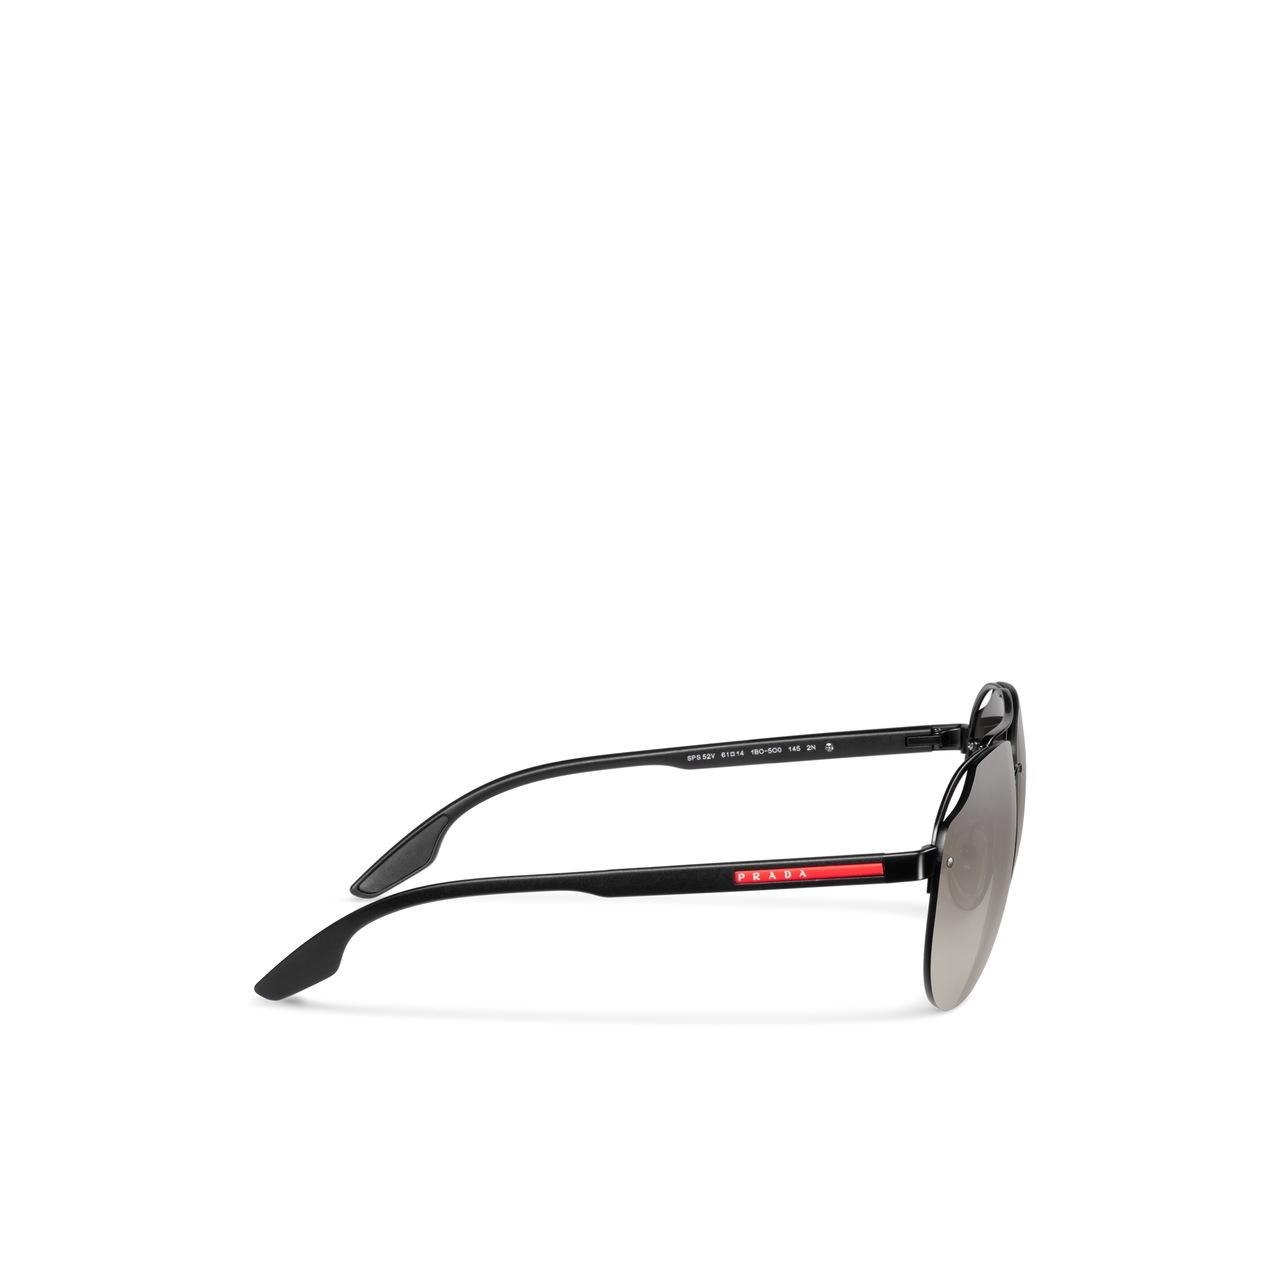 Prada Prada Linea Rossa Eyewear Collection sunglasses 4